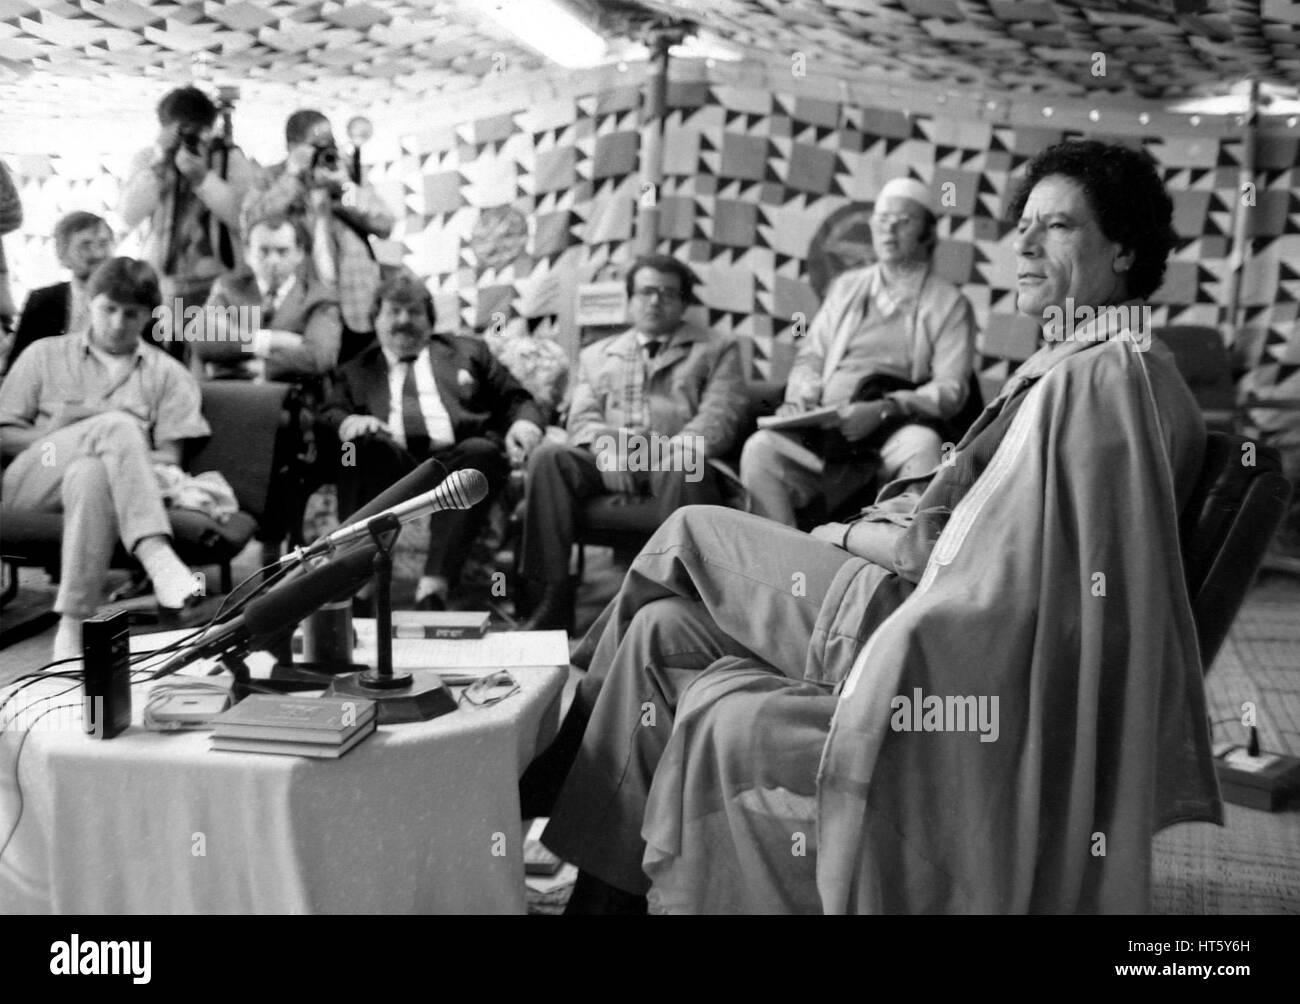 Tripoli, Lybia, Jan. 1988 - The Libyan revolutionary leader Muammar Al-Gaddhafi at the reception of Heinz Weifenbach - Stock Image